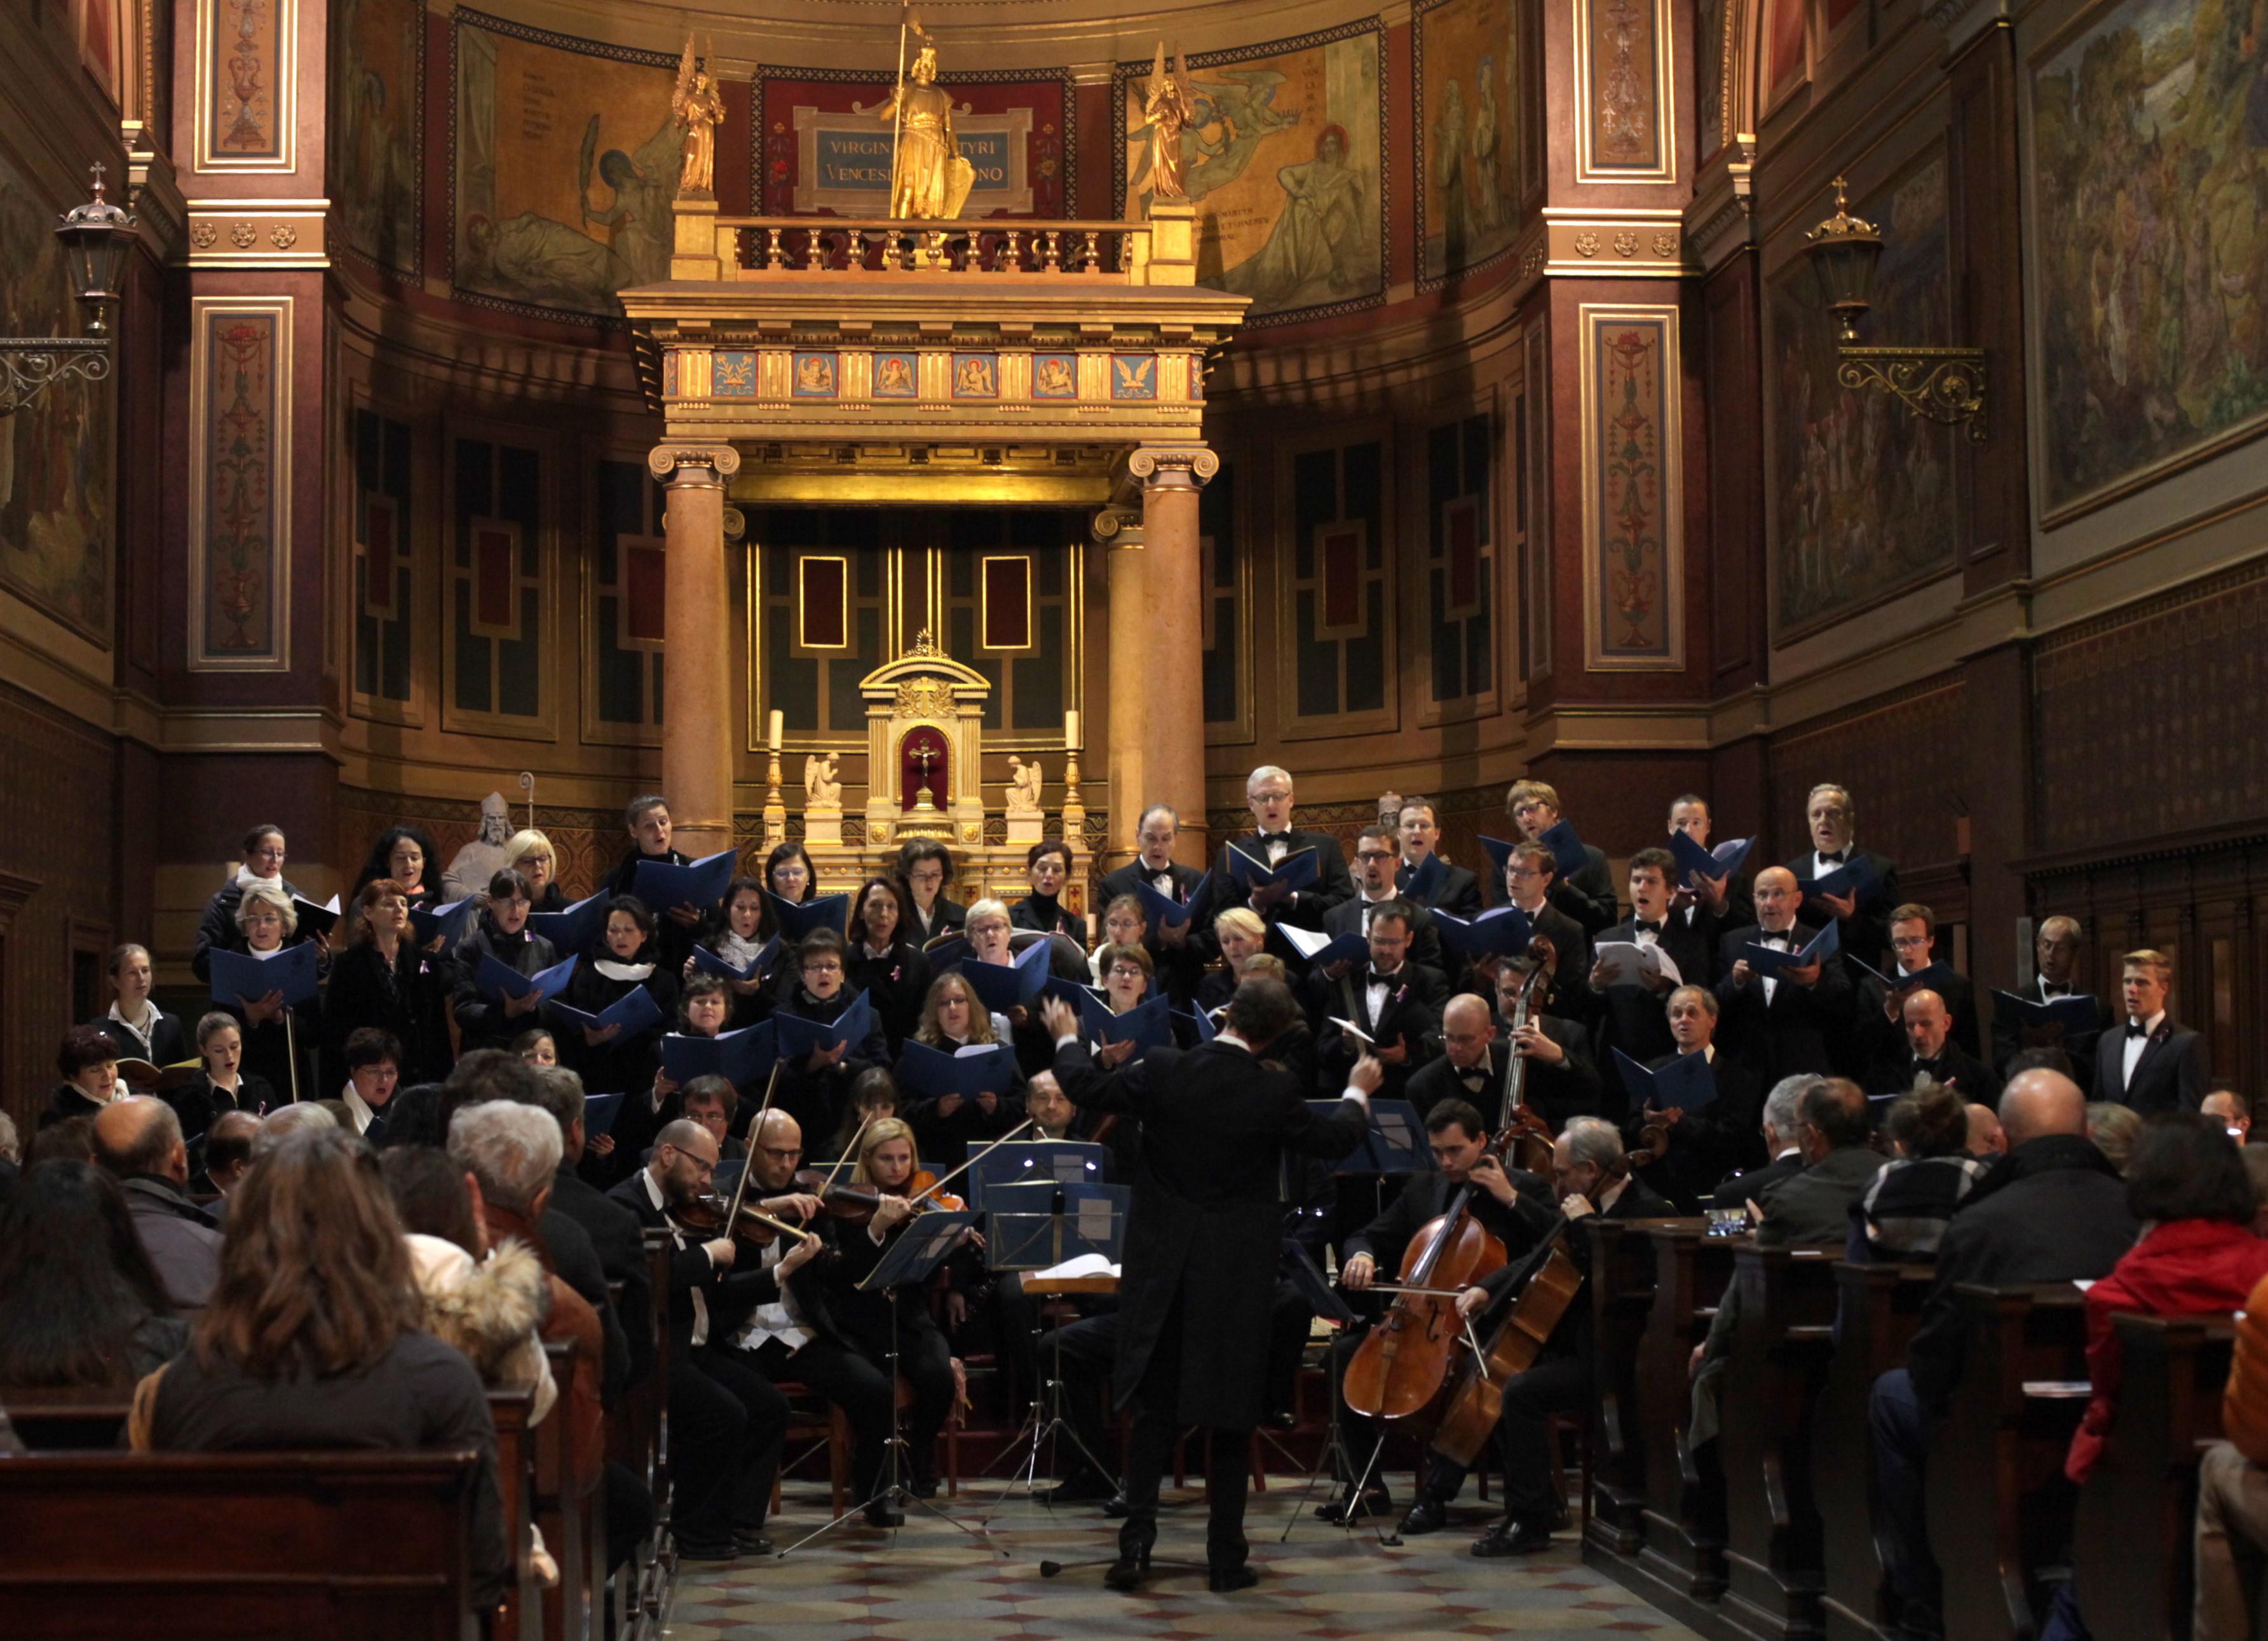 100-let-od-vzniku-ceskoslovenska-koncert-bach-collegia-praha-v-kostele-sv-vaclava